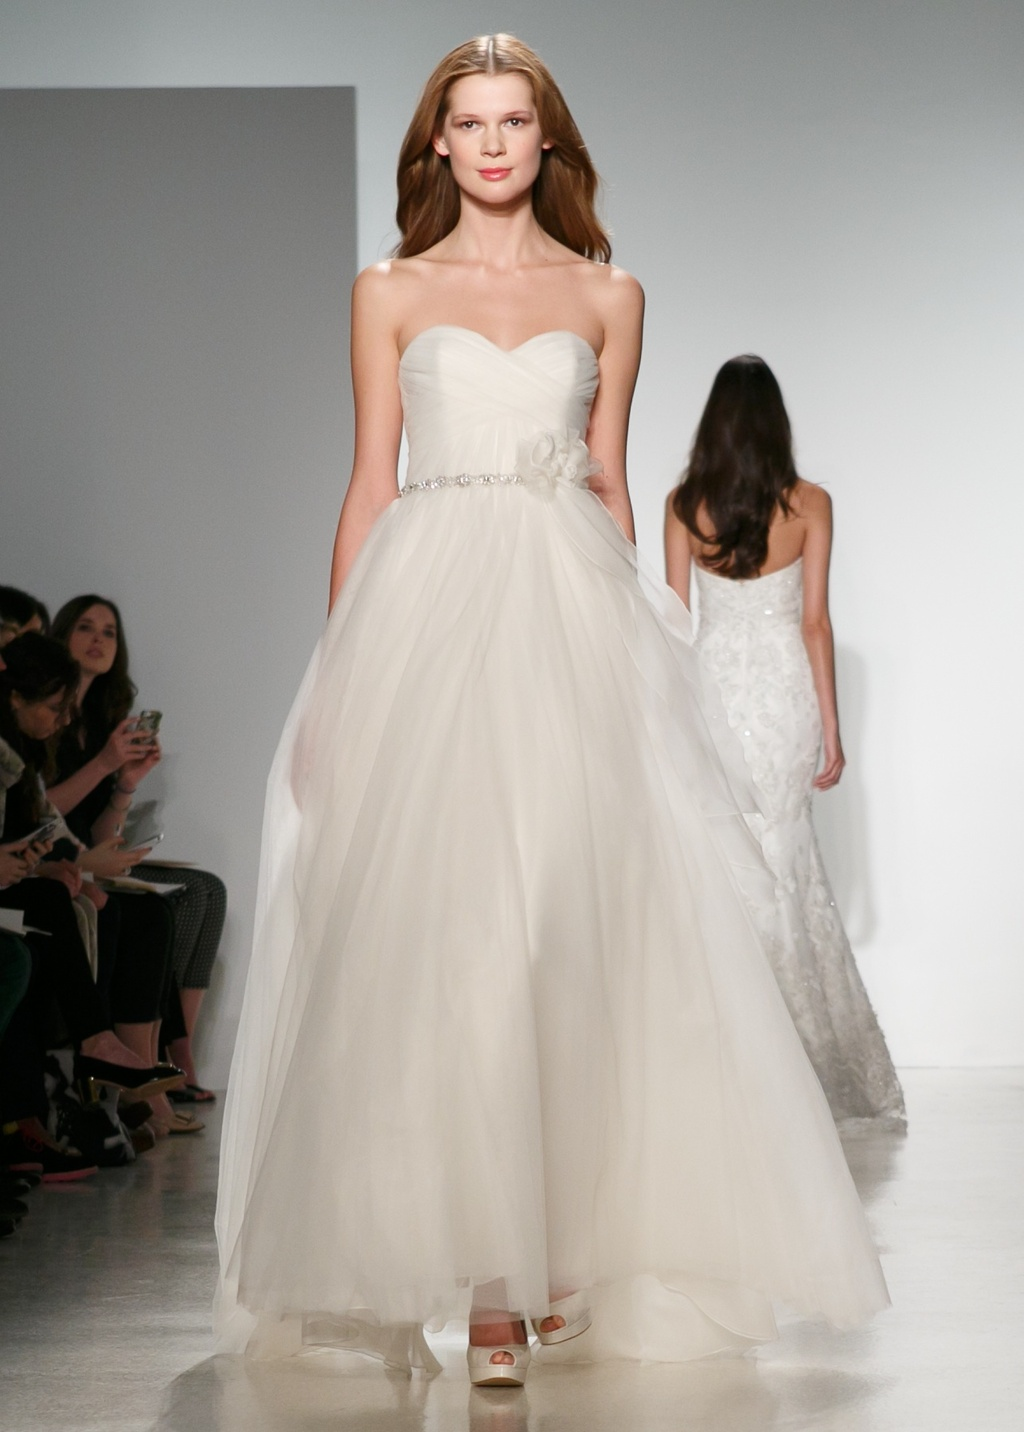 Christos-wedding-dress-spring-2014-bridal-8b.full